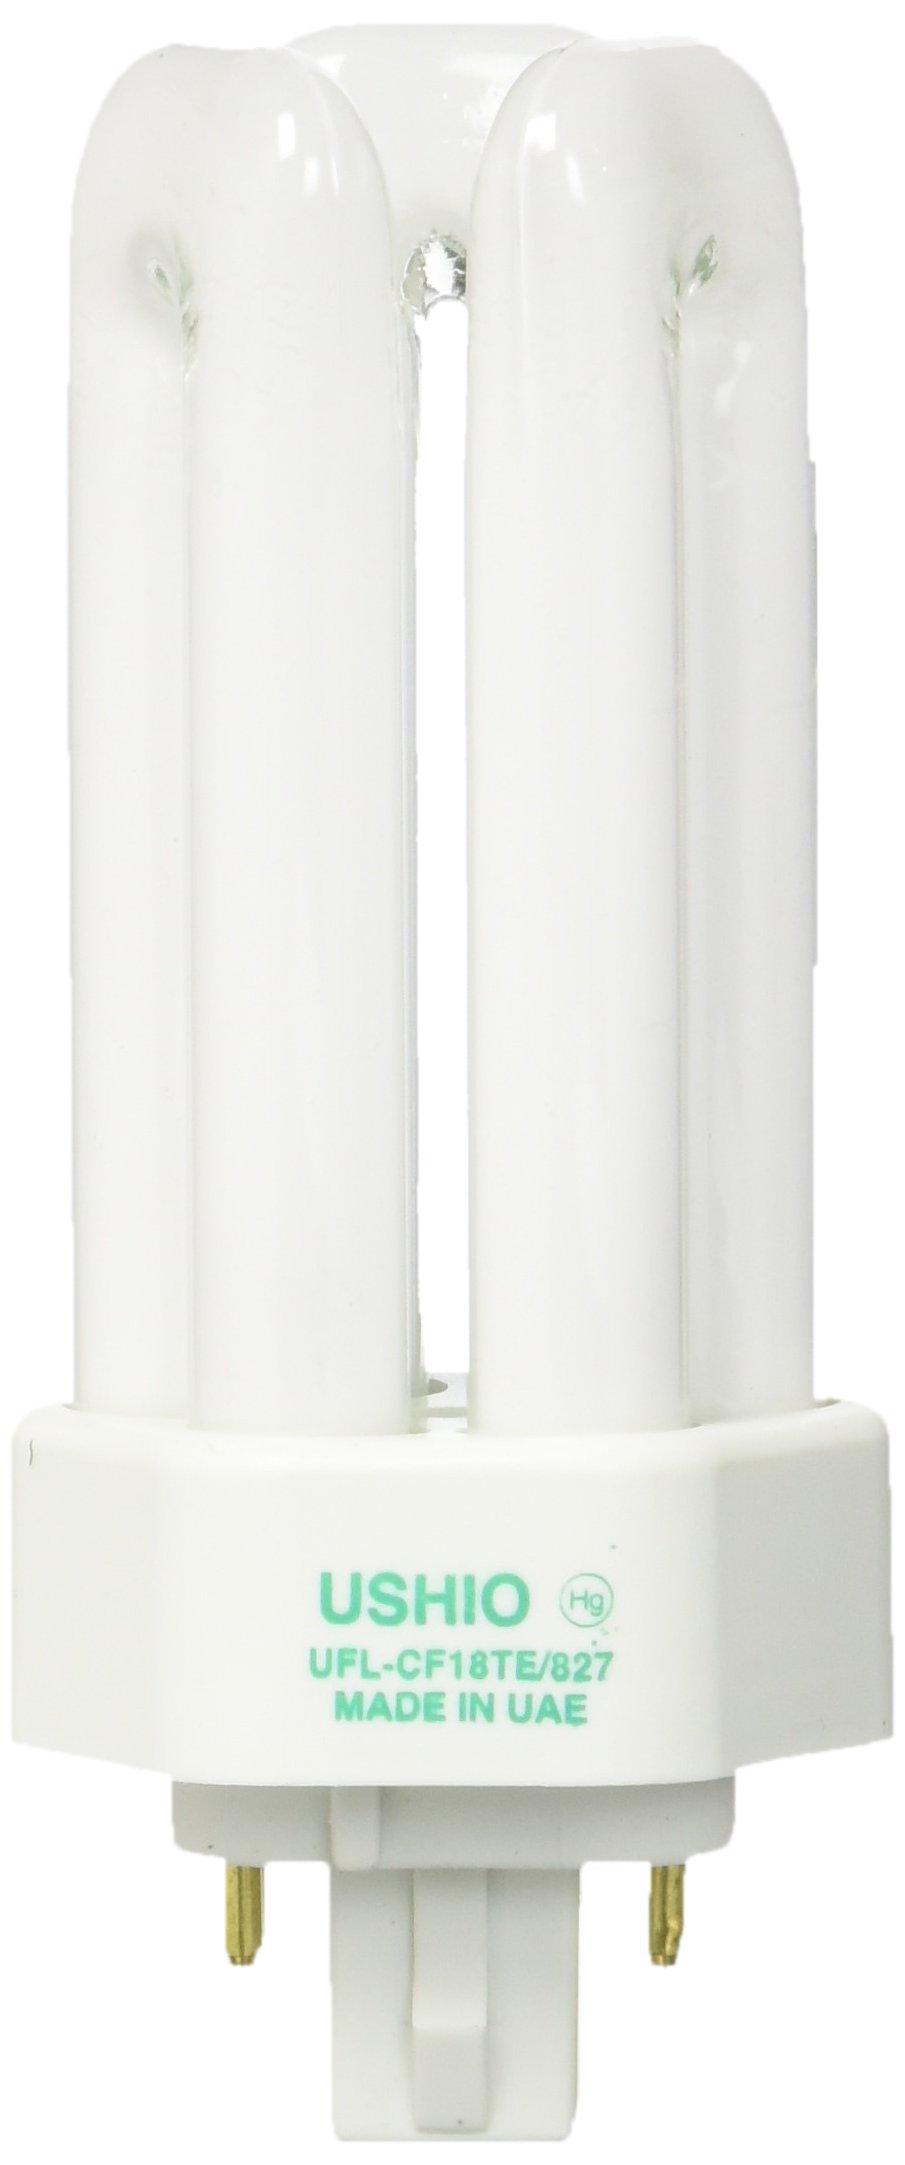 Ushio BC1339 3000140 CF13D//841 Double Tube 2 Pin Base Compact Fluorescent Bulb